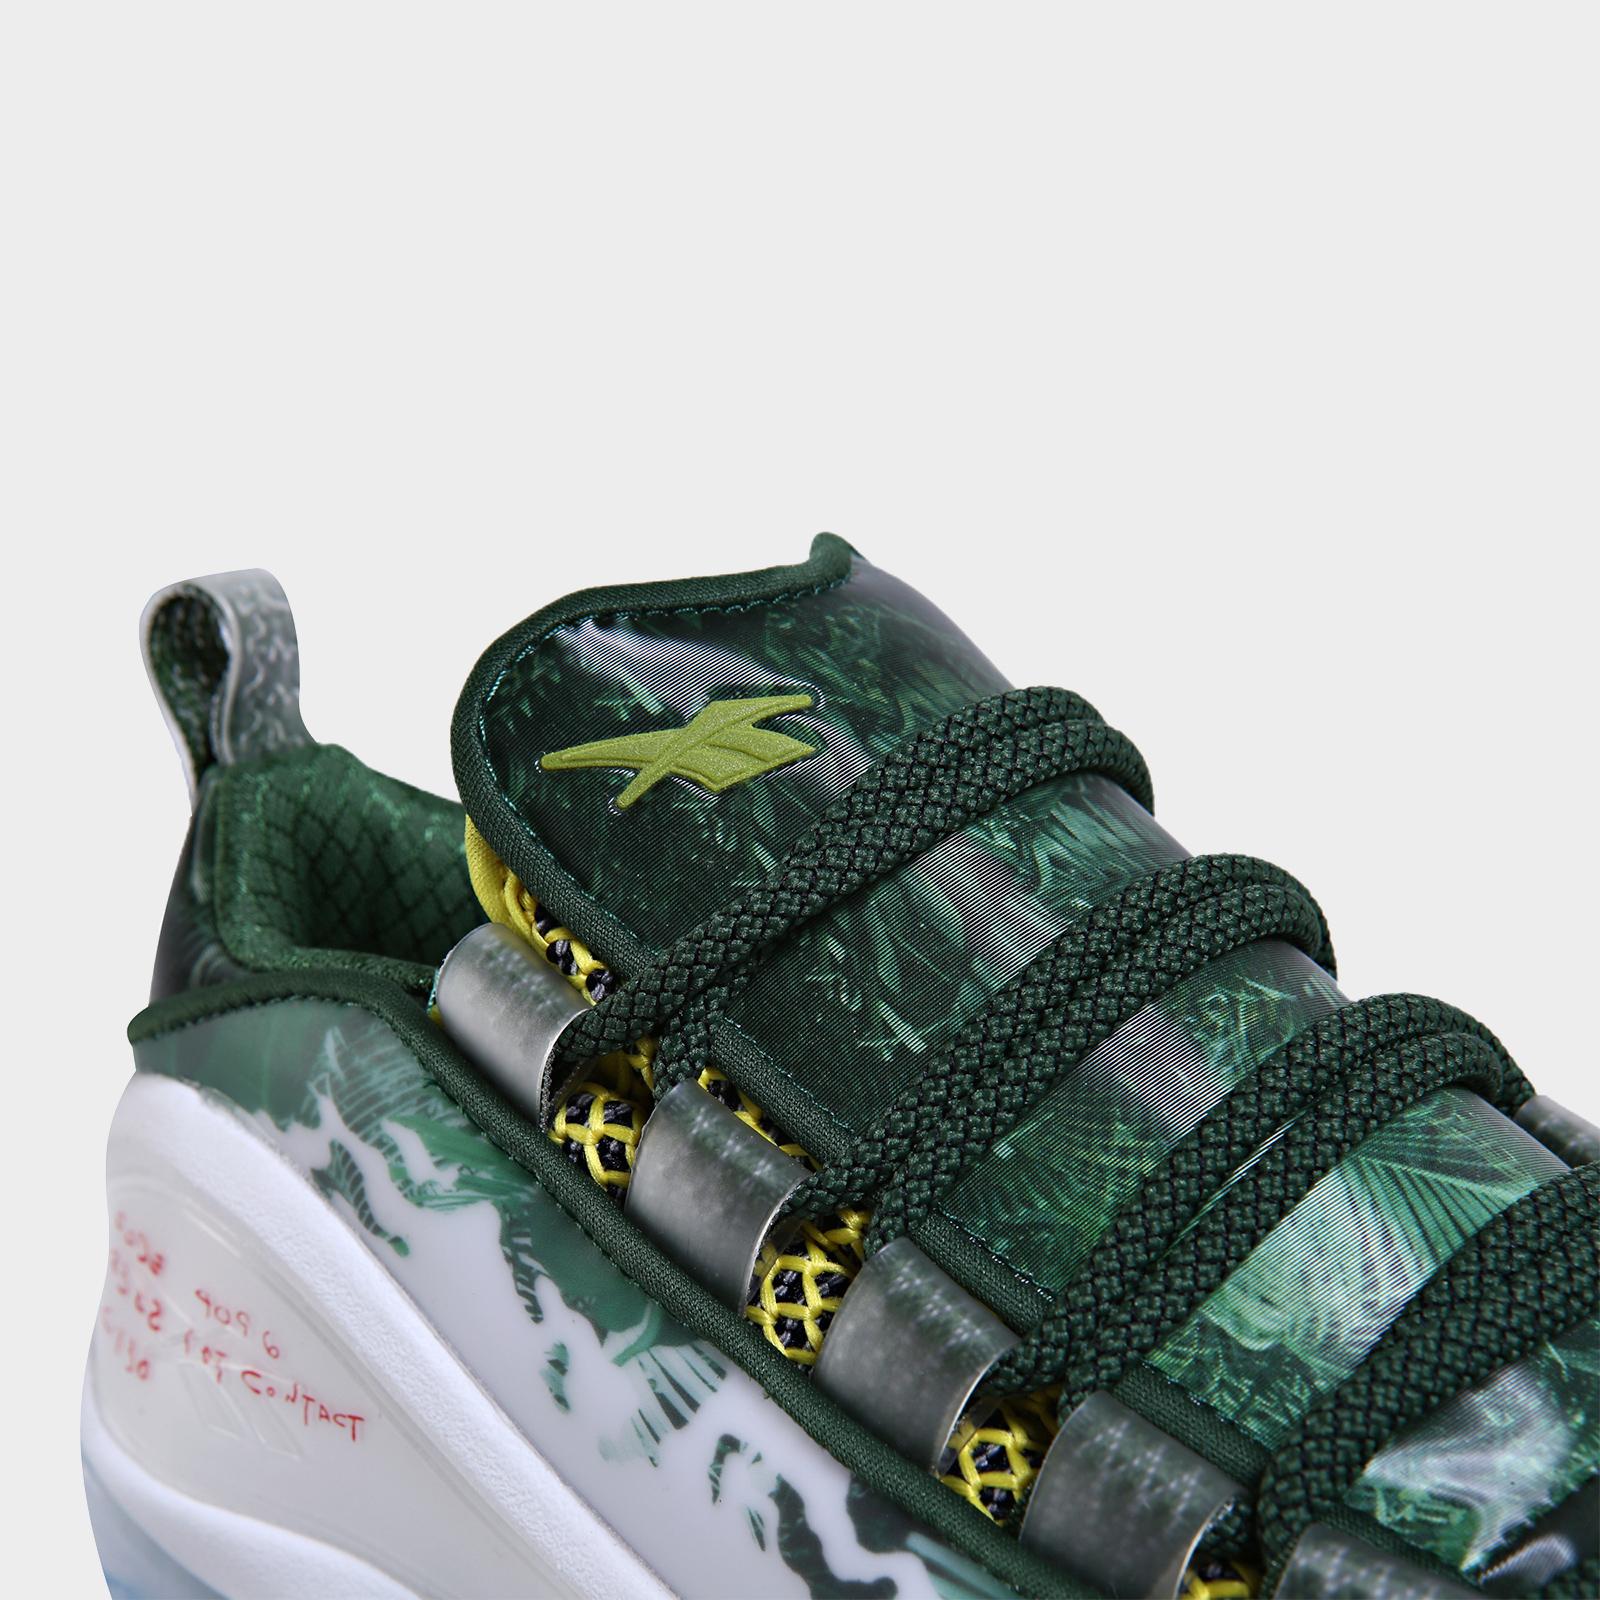 2af9de36780 Reebok Dmx Run 10 Predator - Cn7155 - Sneakersnstuff